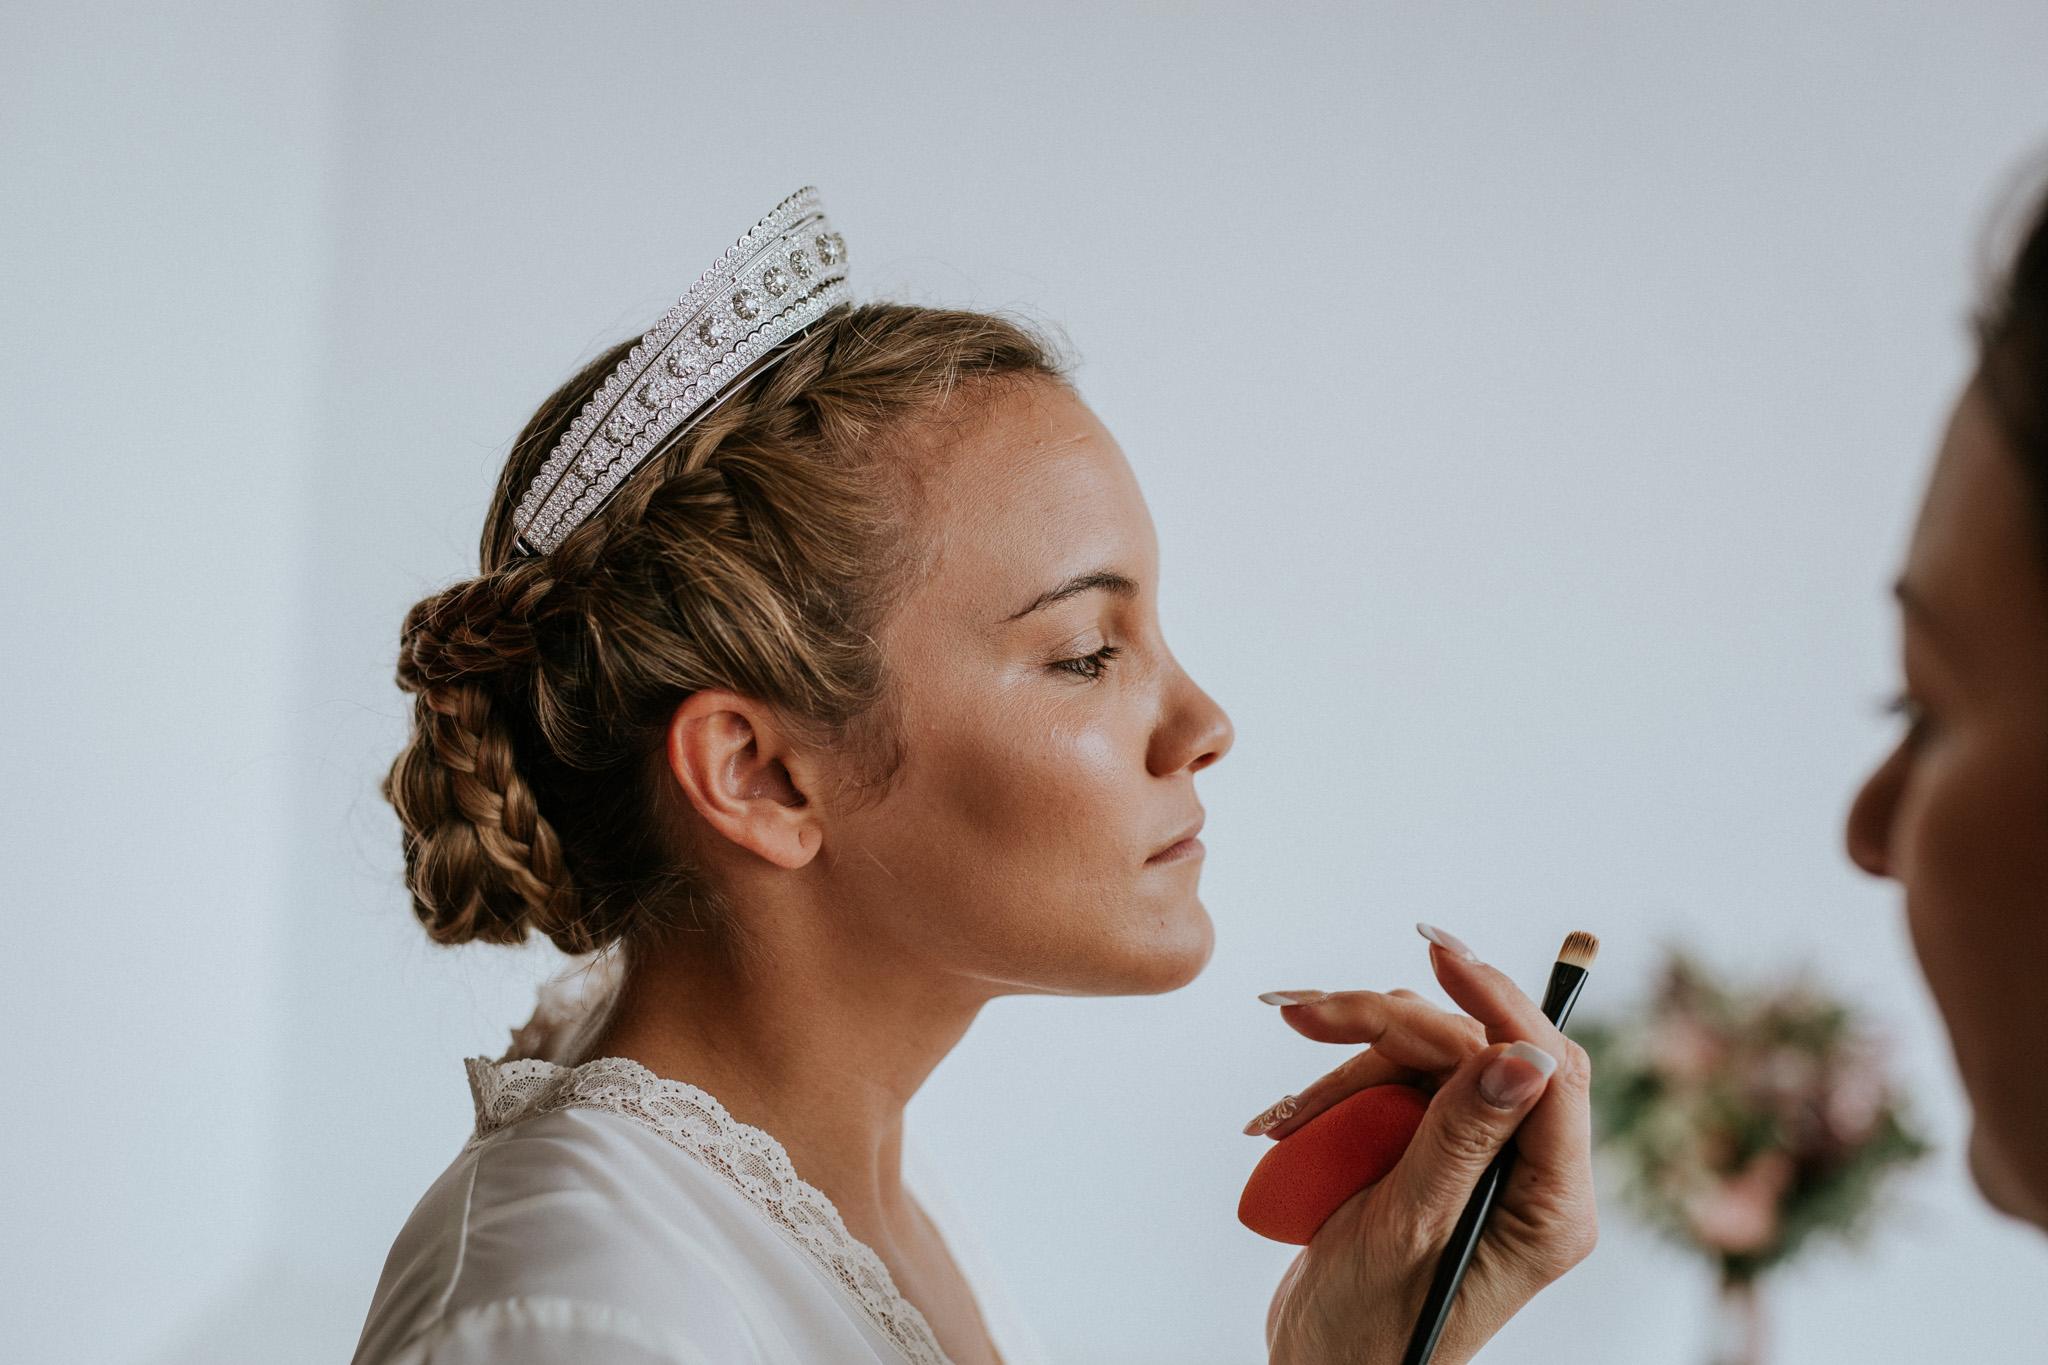 fotografia-boda-wedding-photographer-spain-concorazon-34